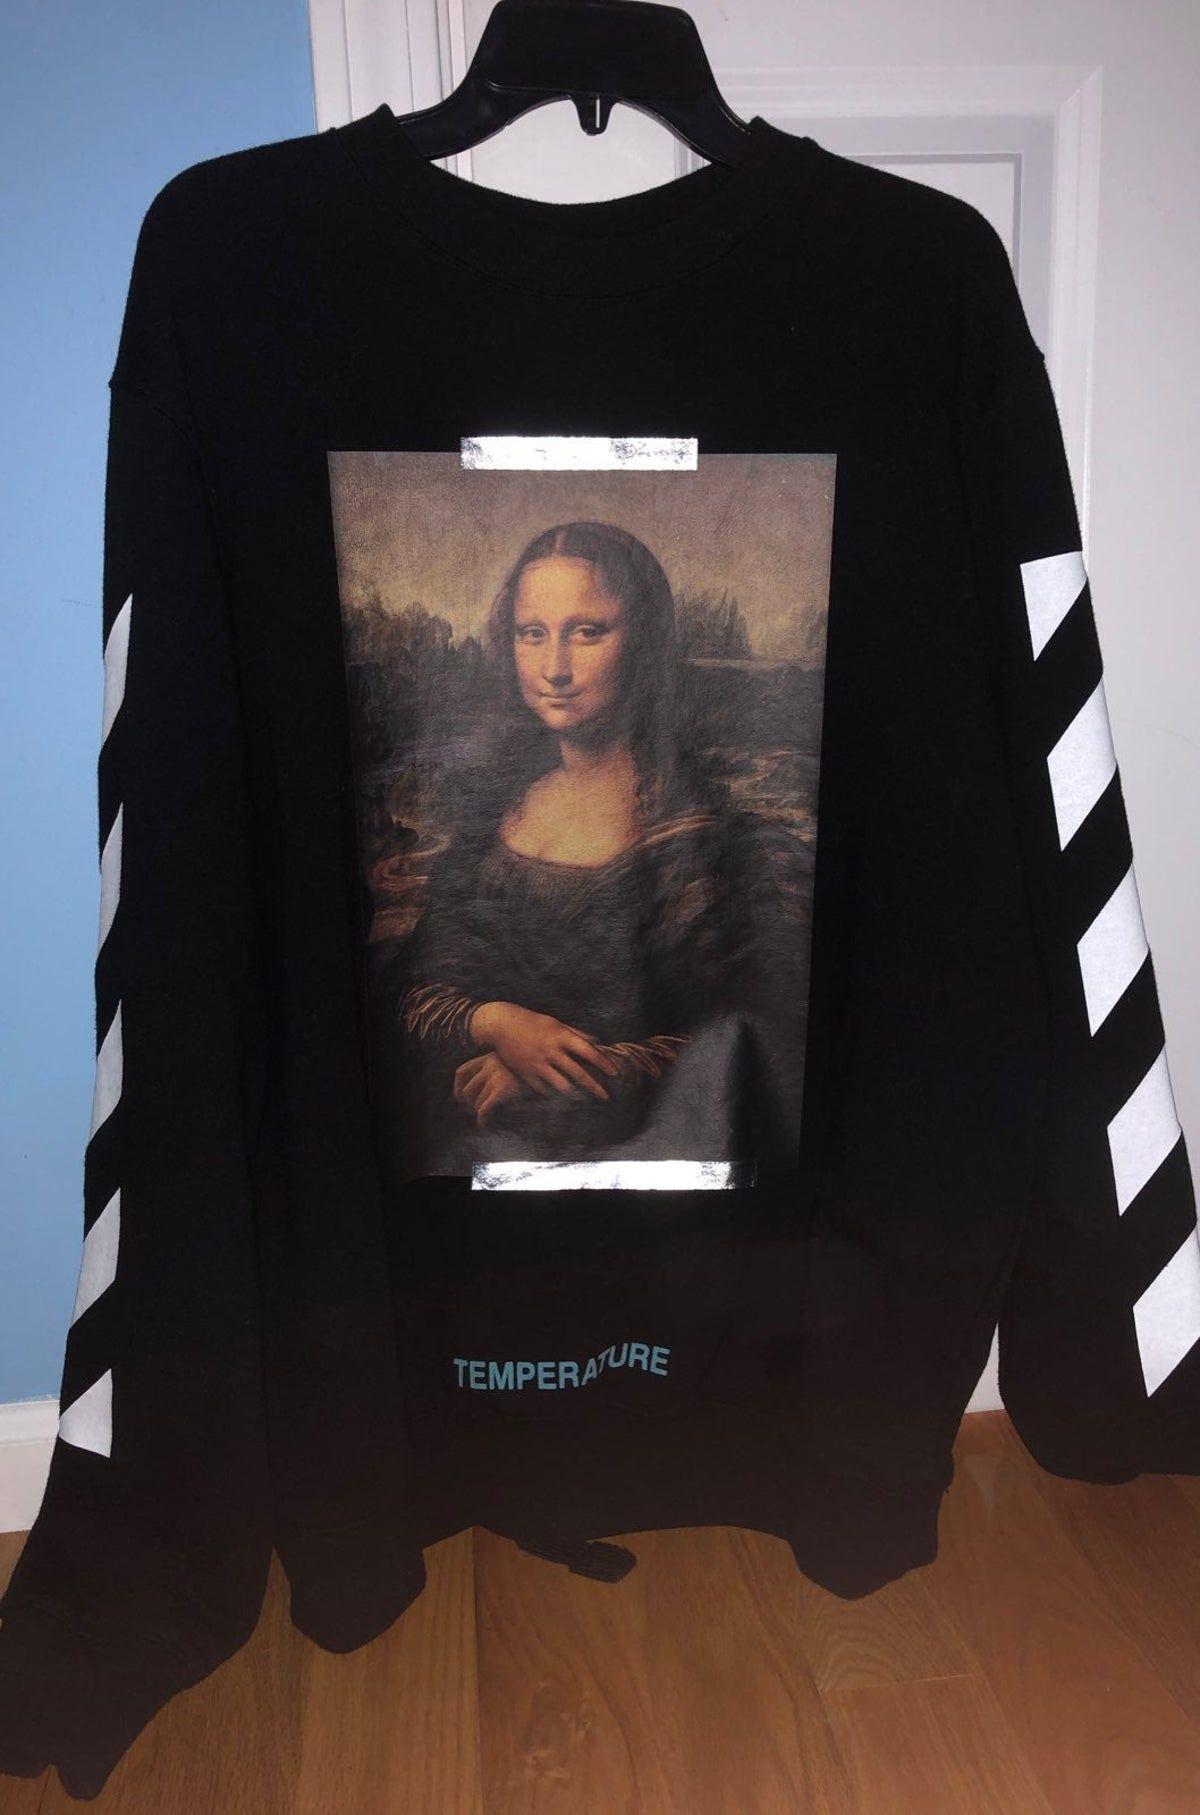 Off White Mona Lisa Crewneck Off White Sweatshirt White Crewneck White Crew Neck [ 1815 x 1200 Pixel ]